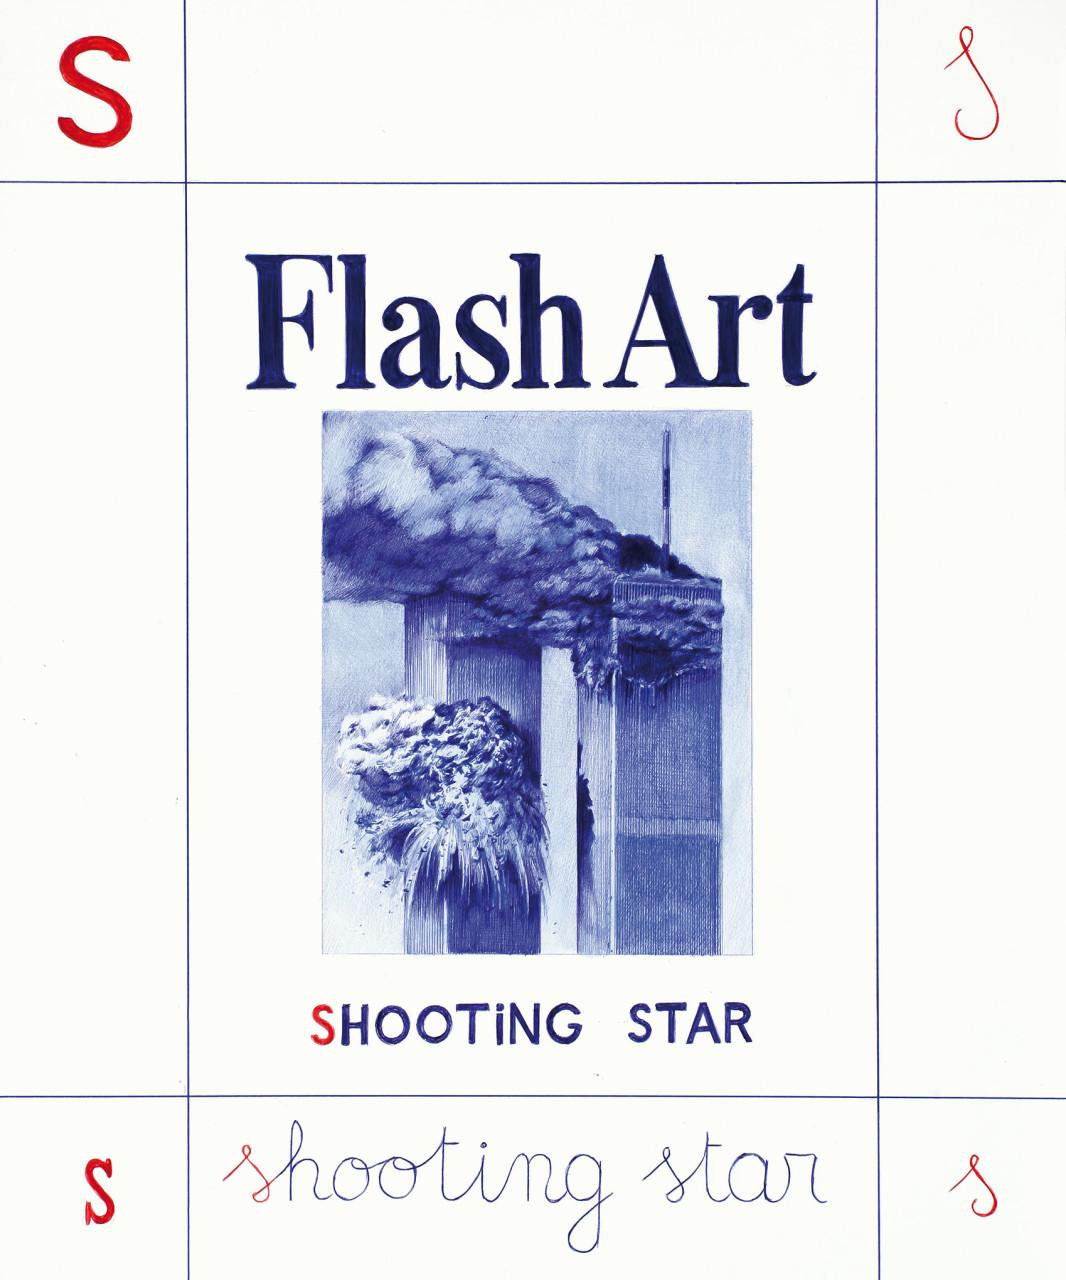 06S-shooting star_bassa